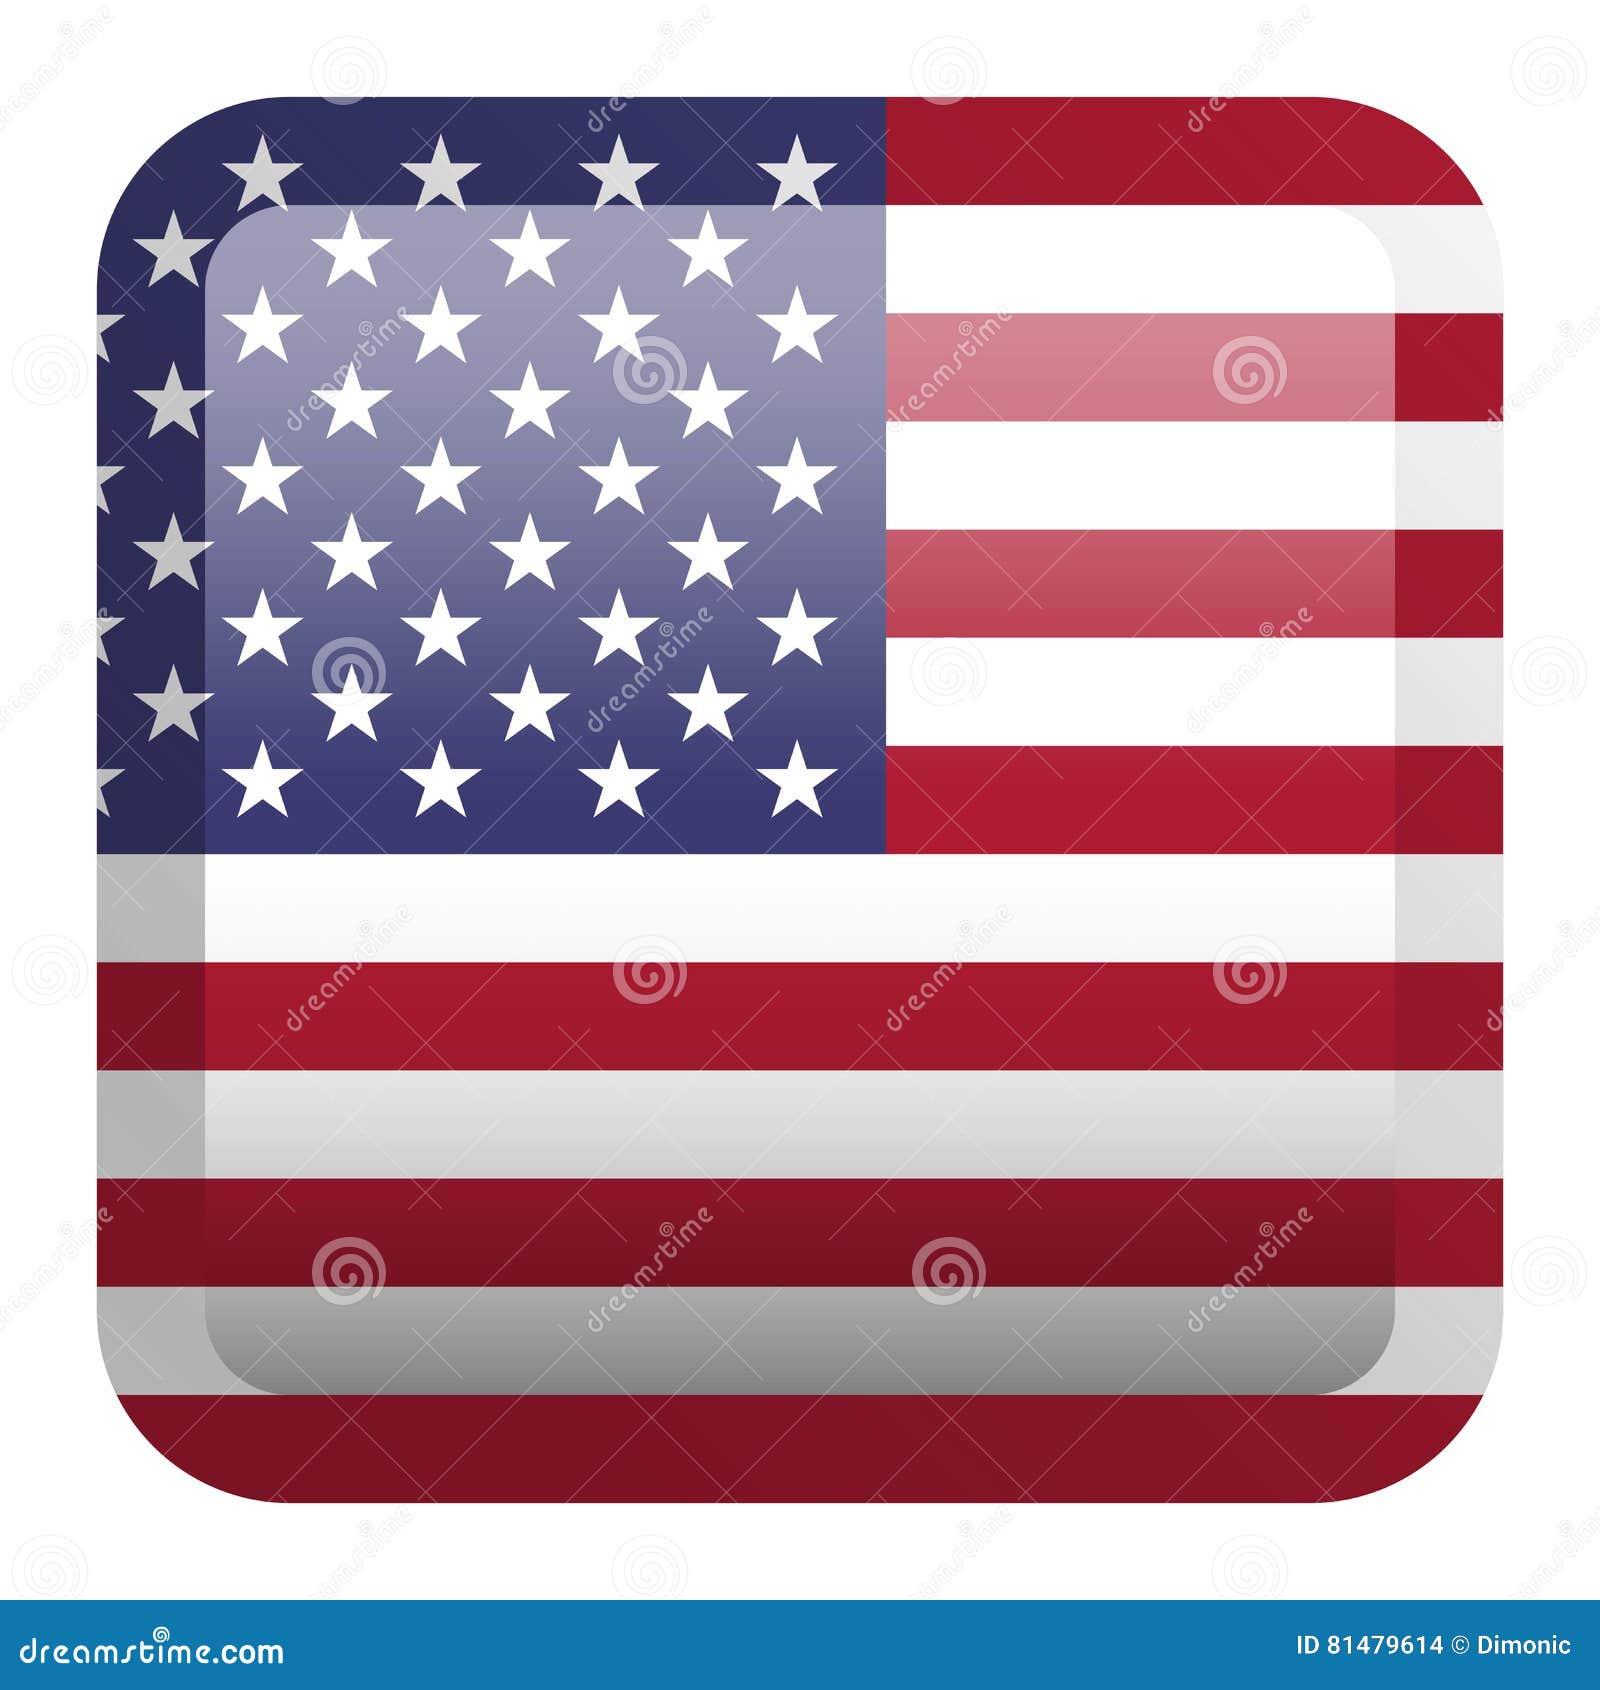 d6c3086e73de USA Flag. Square Glossy Button Stock Vector - Illustration of color ...